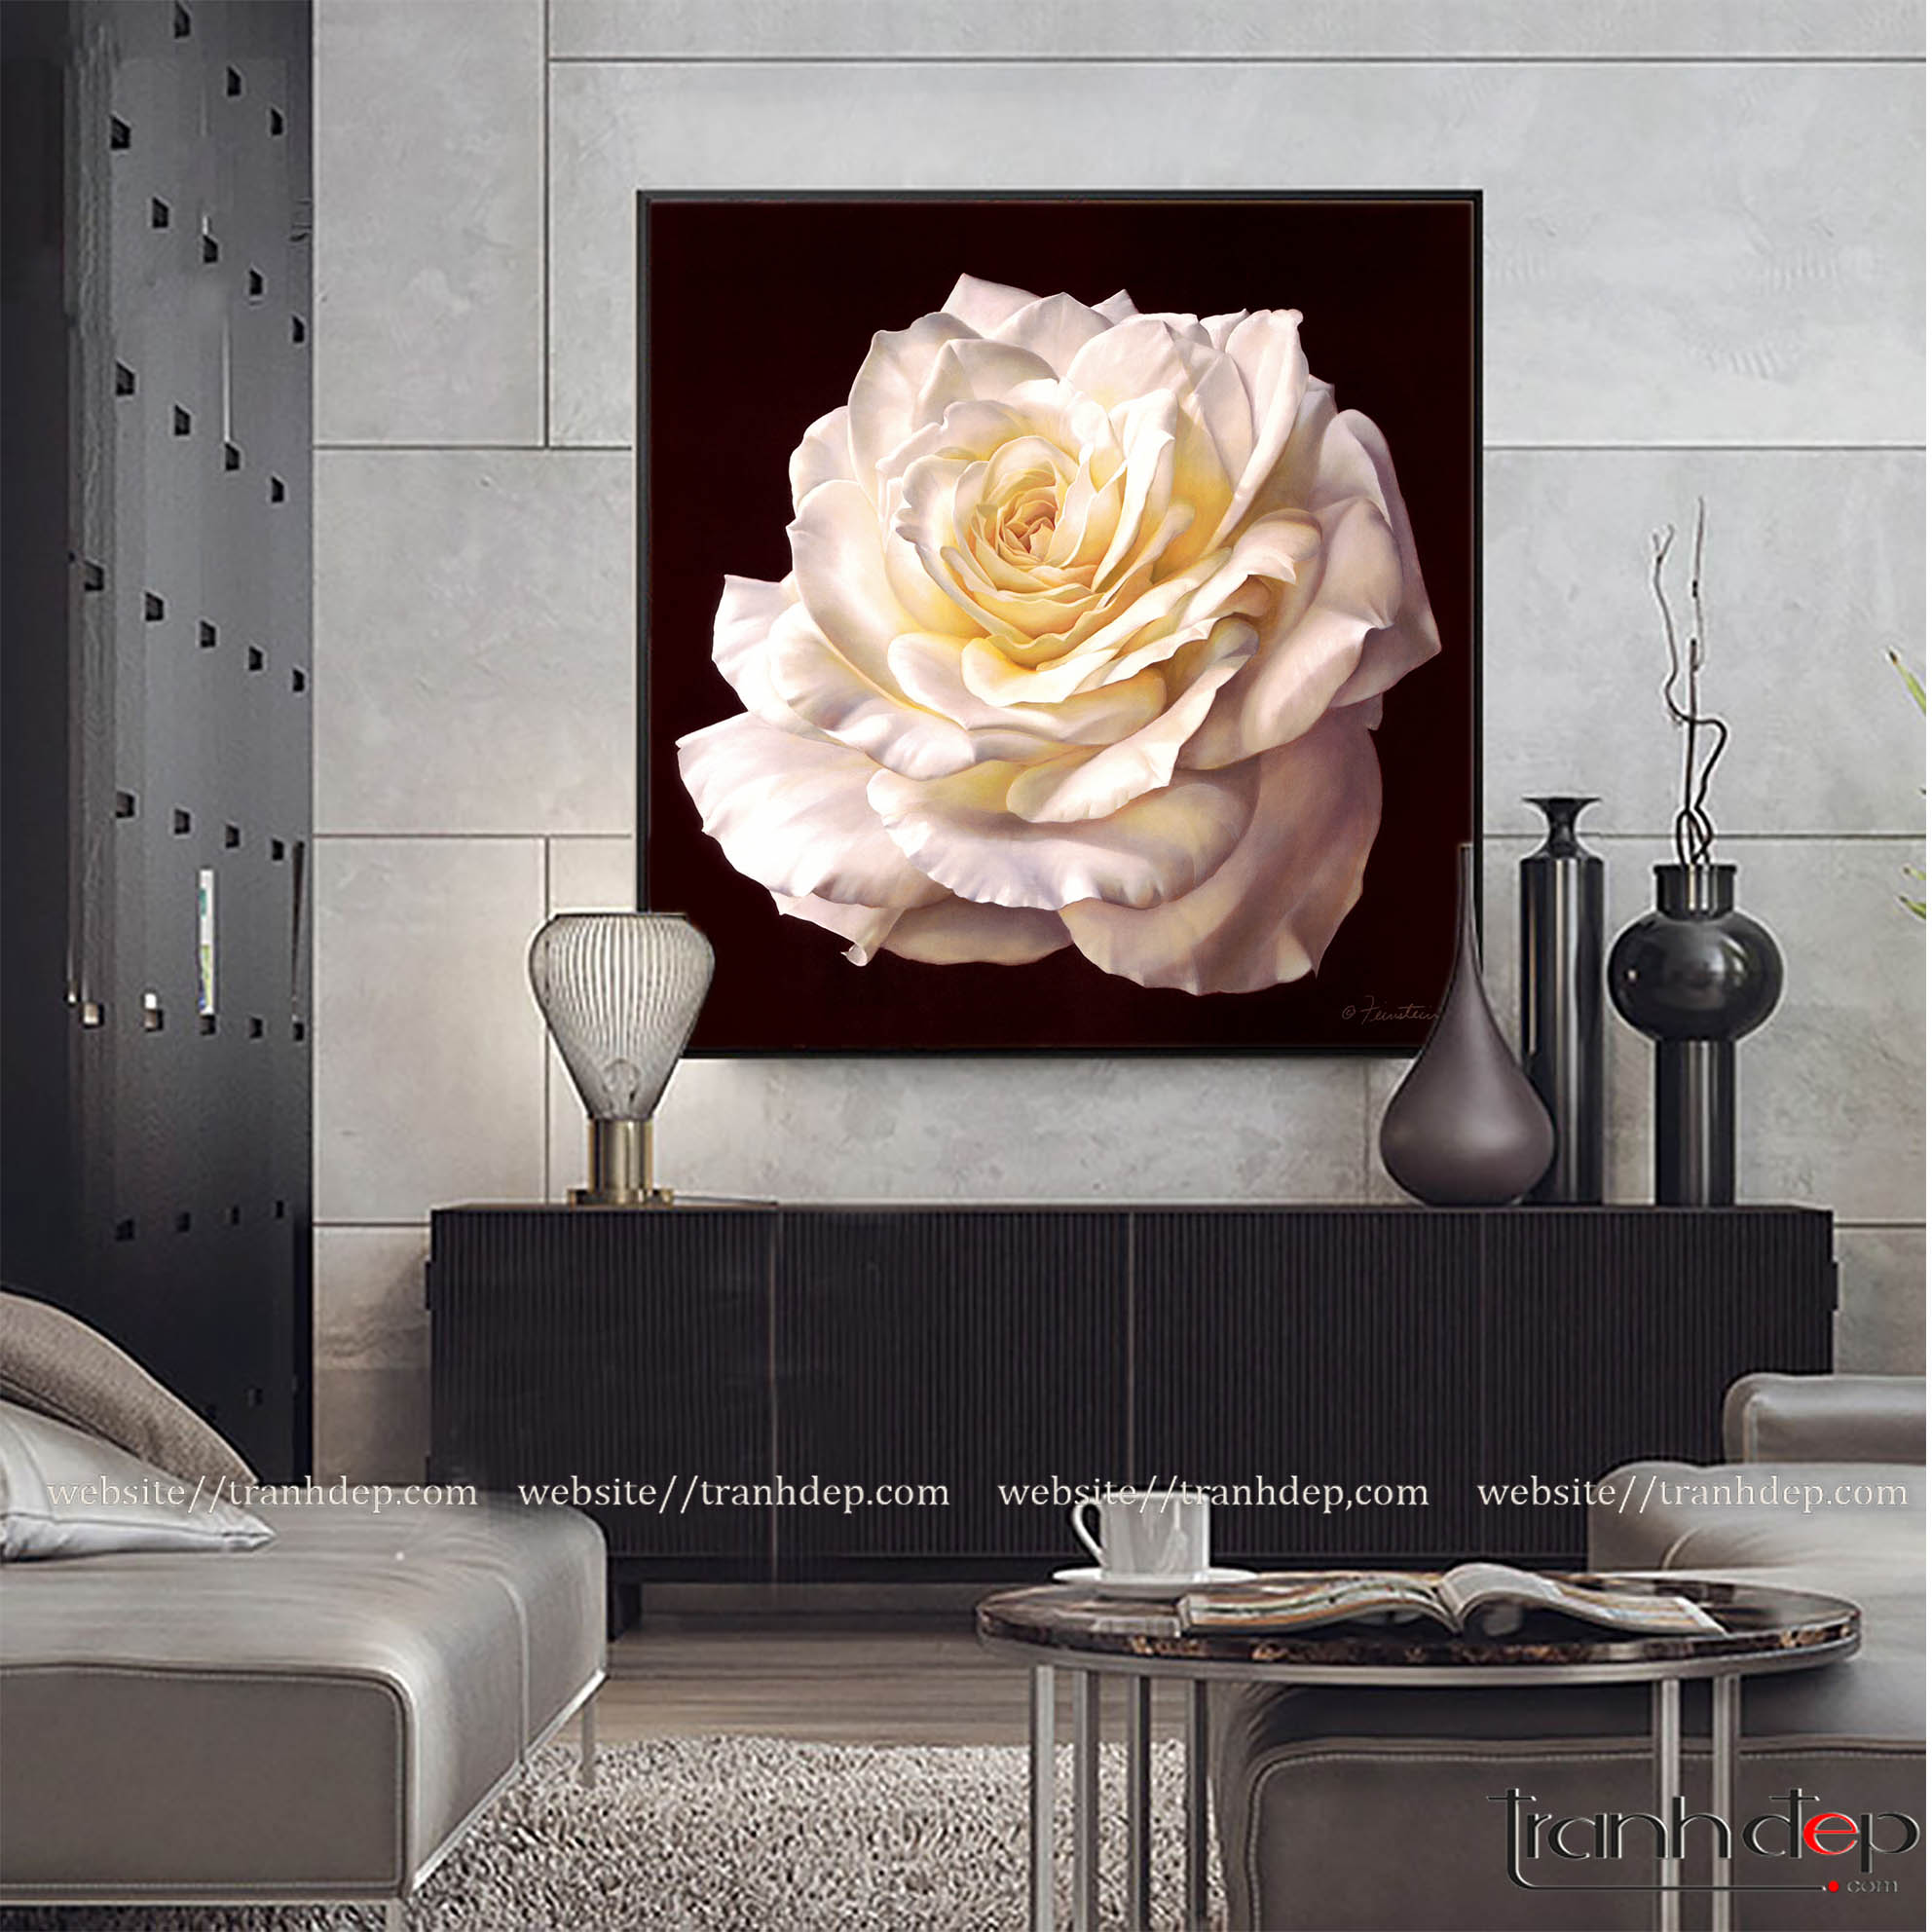 tranh hoa hồng treo tường